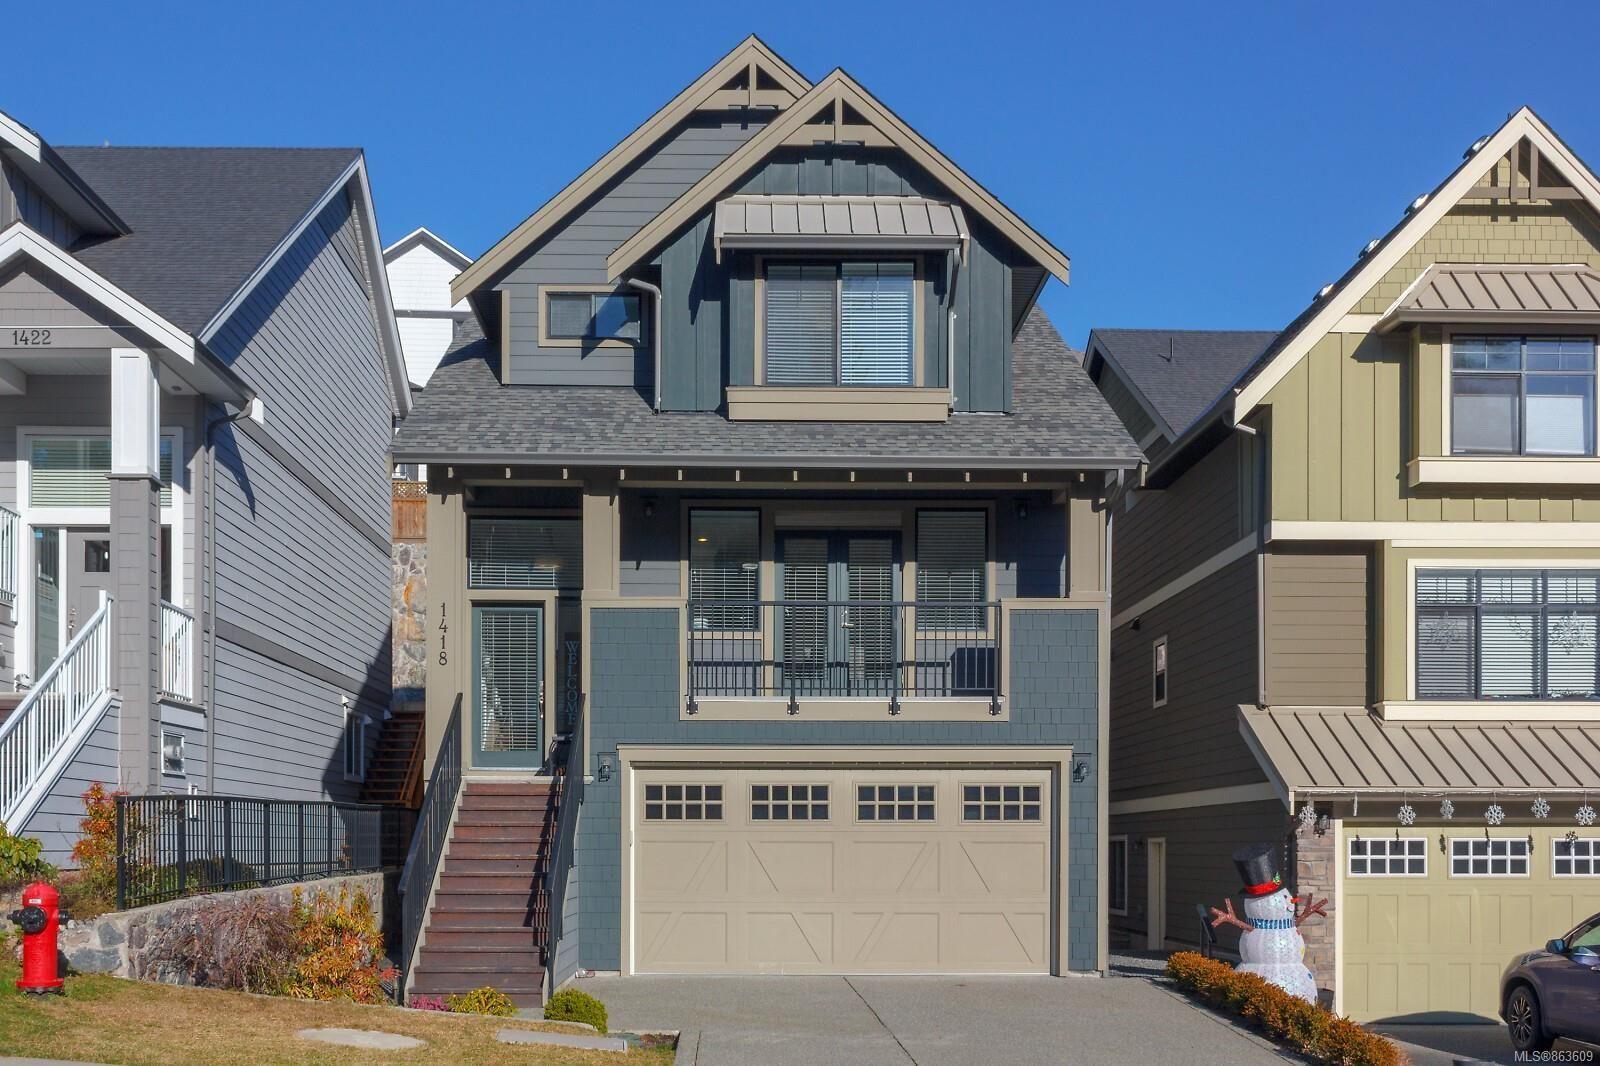 Main Photo: 1418 Commander Crt in : La Westhills House for sale (Langford)  : MLS®# 863609